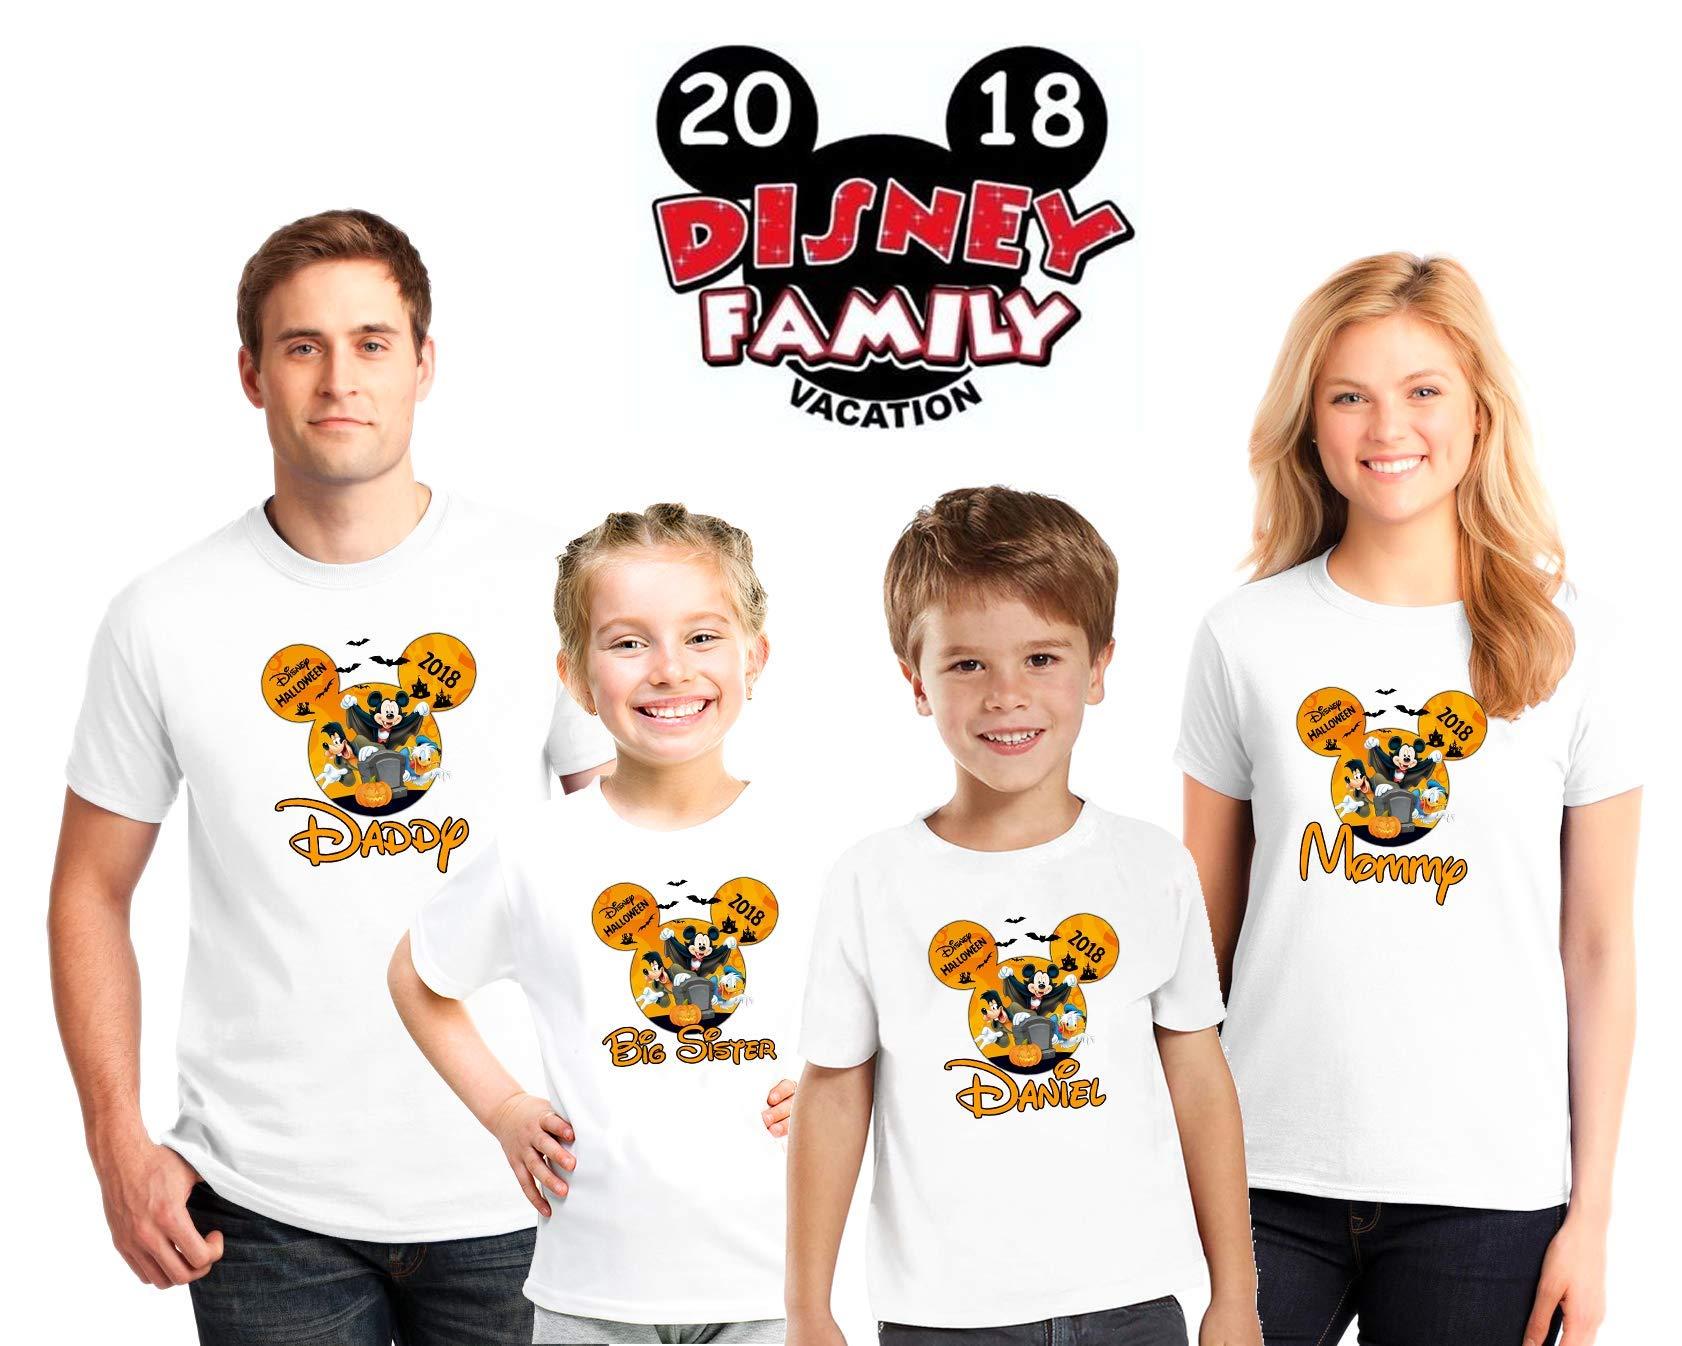 Halloween Disney family matching custom shirts, Halloween Family vacation Disney shirts, Personalized matching Disney Shirts for Family by Bachelorettees